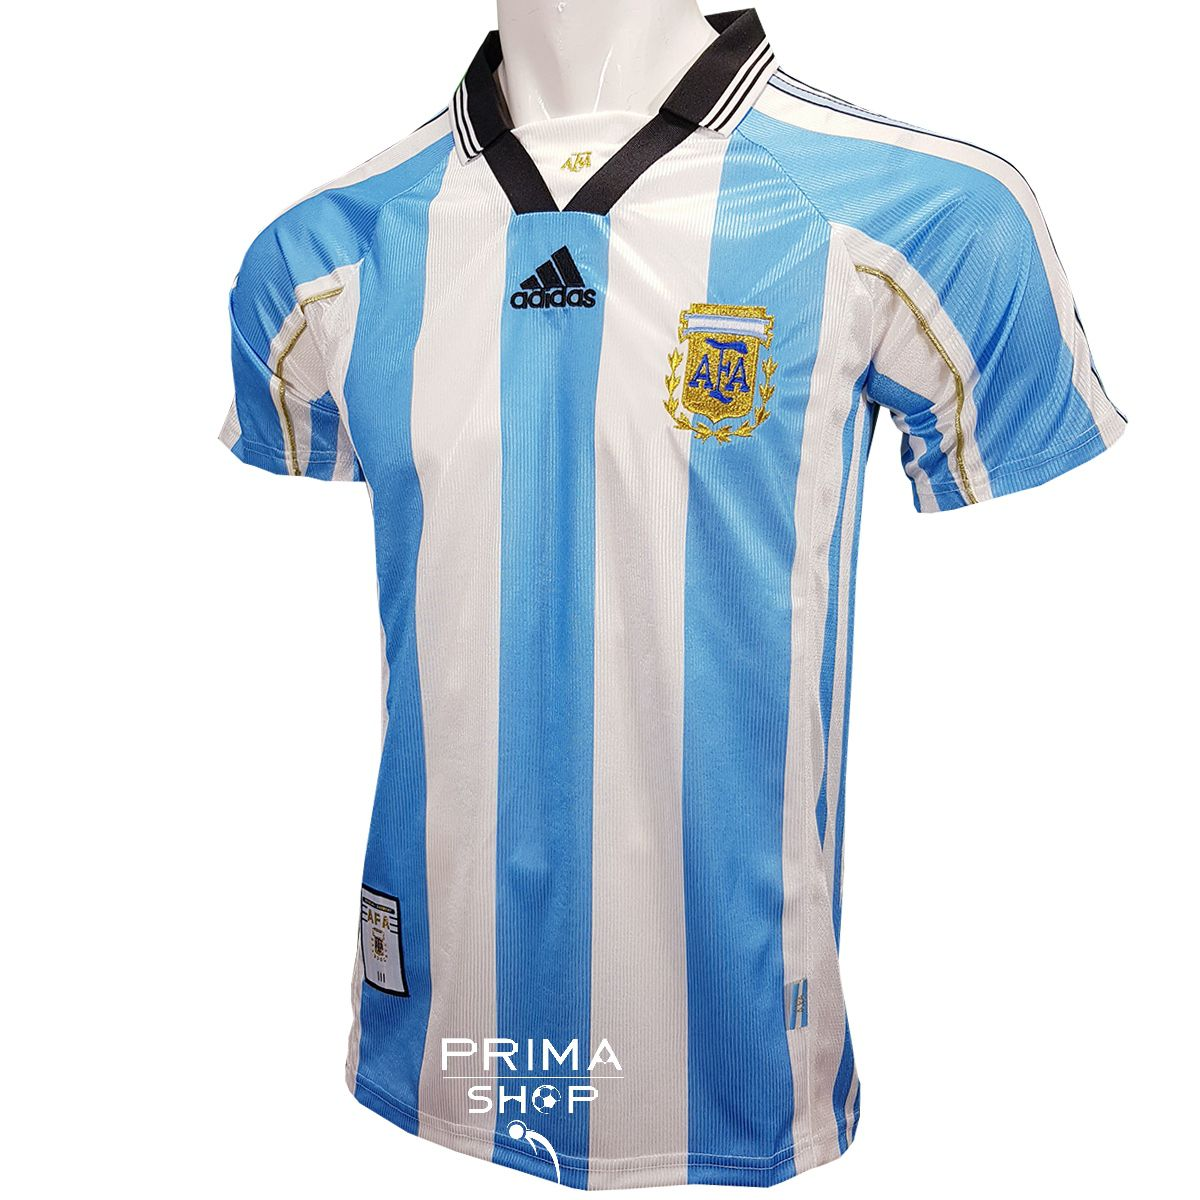 لباس کلاسیک آرژانتین 1998